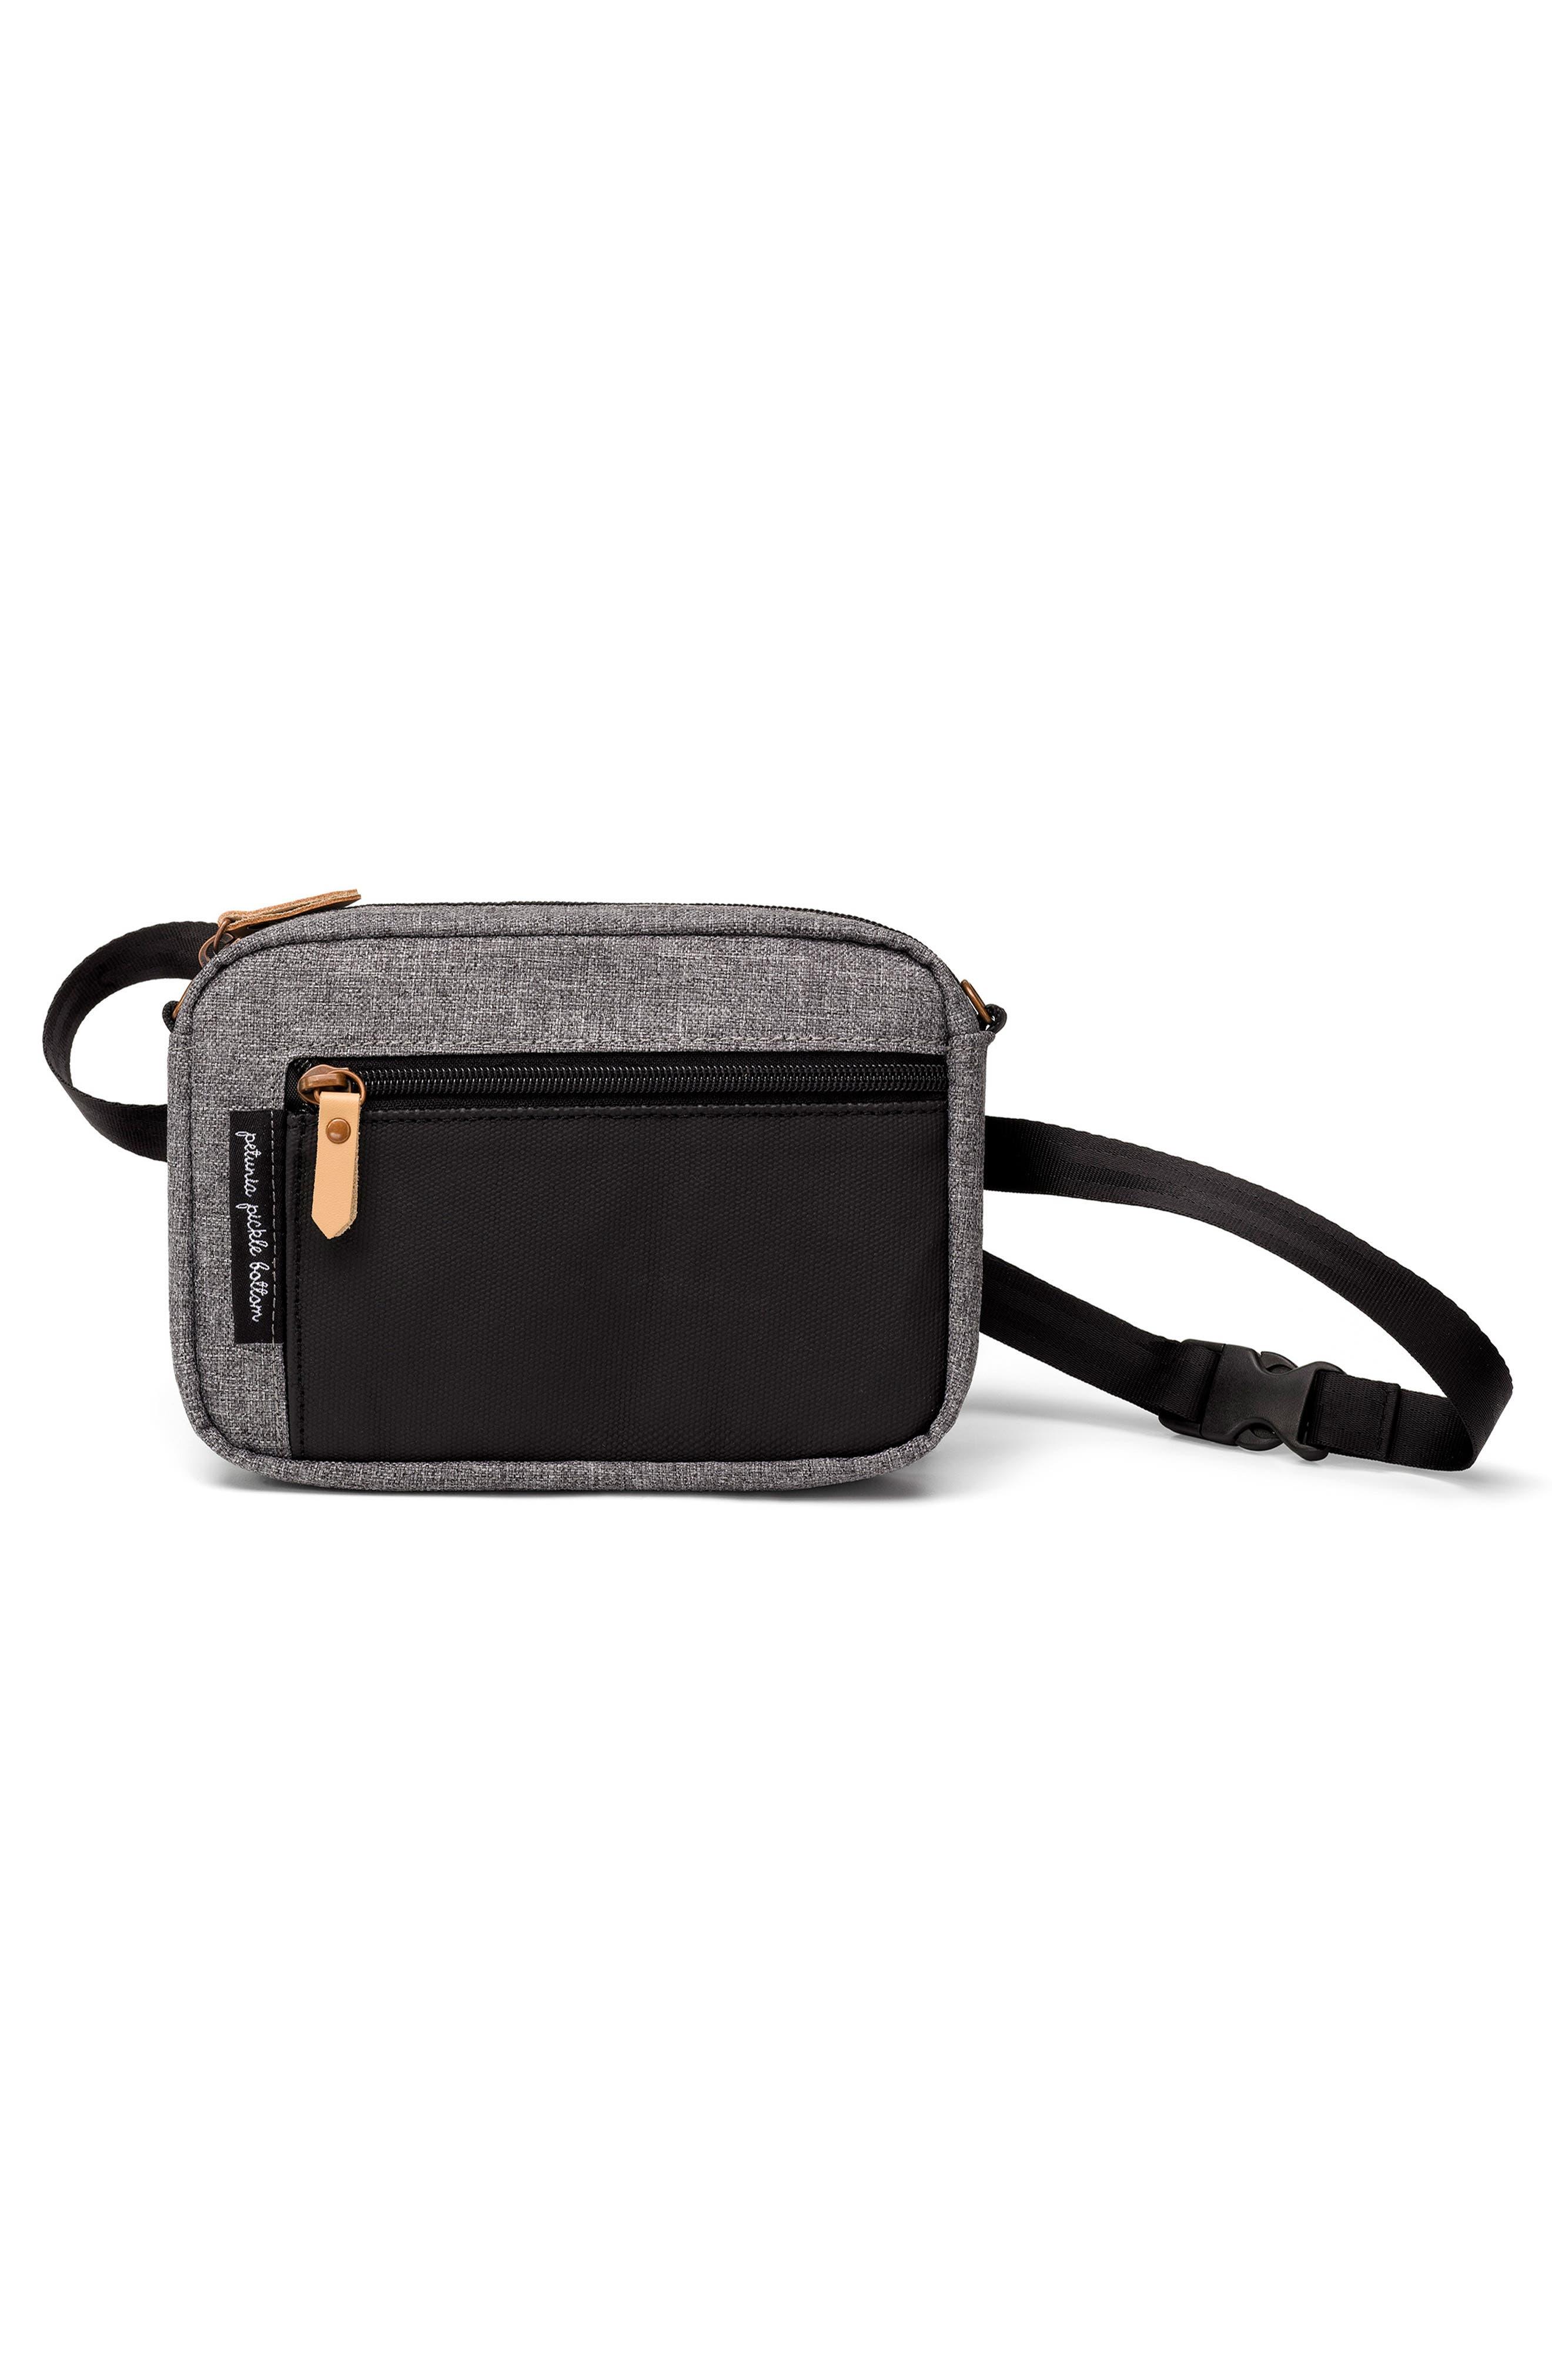 Adventurer Belt Bag,                             Alternate thumbnail 4, color,                             GRAPHITE/ BLACK